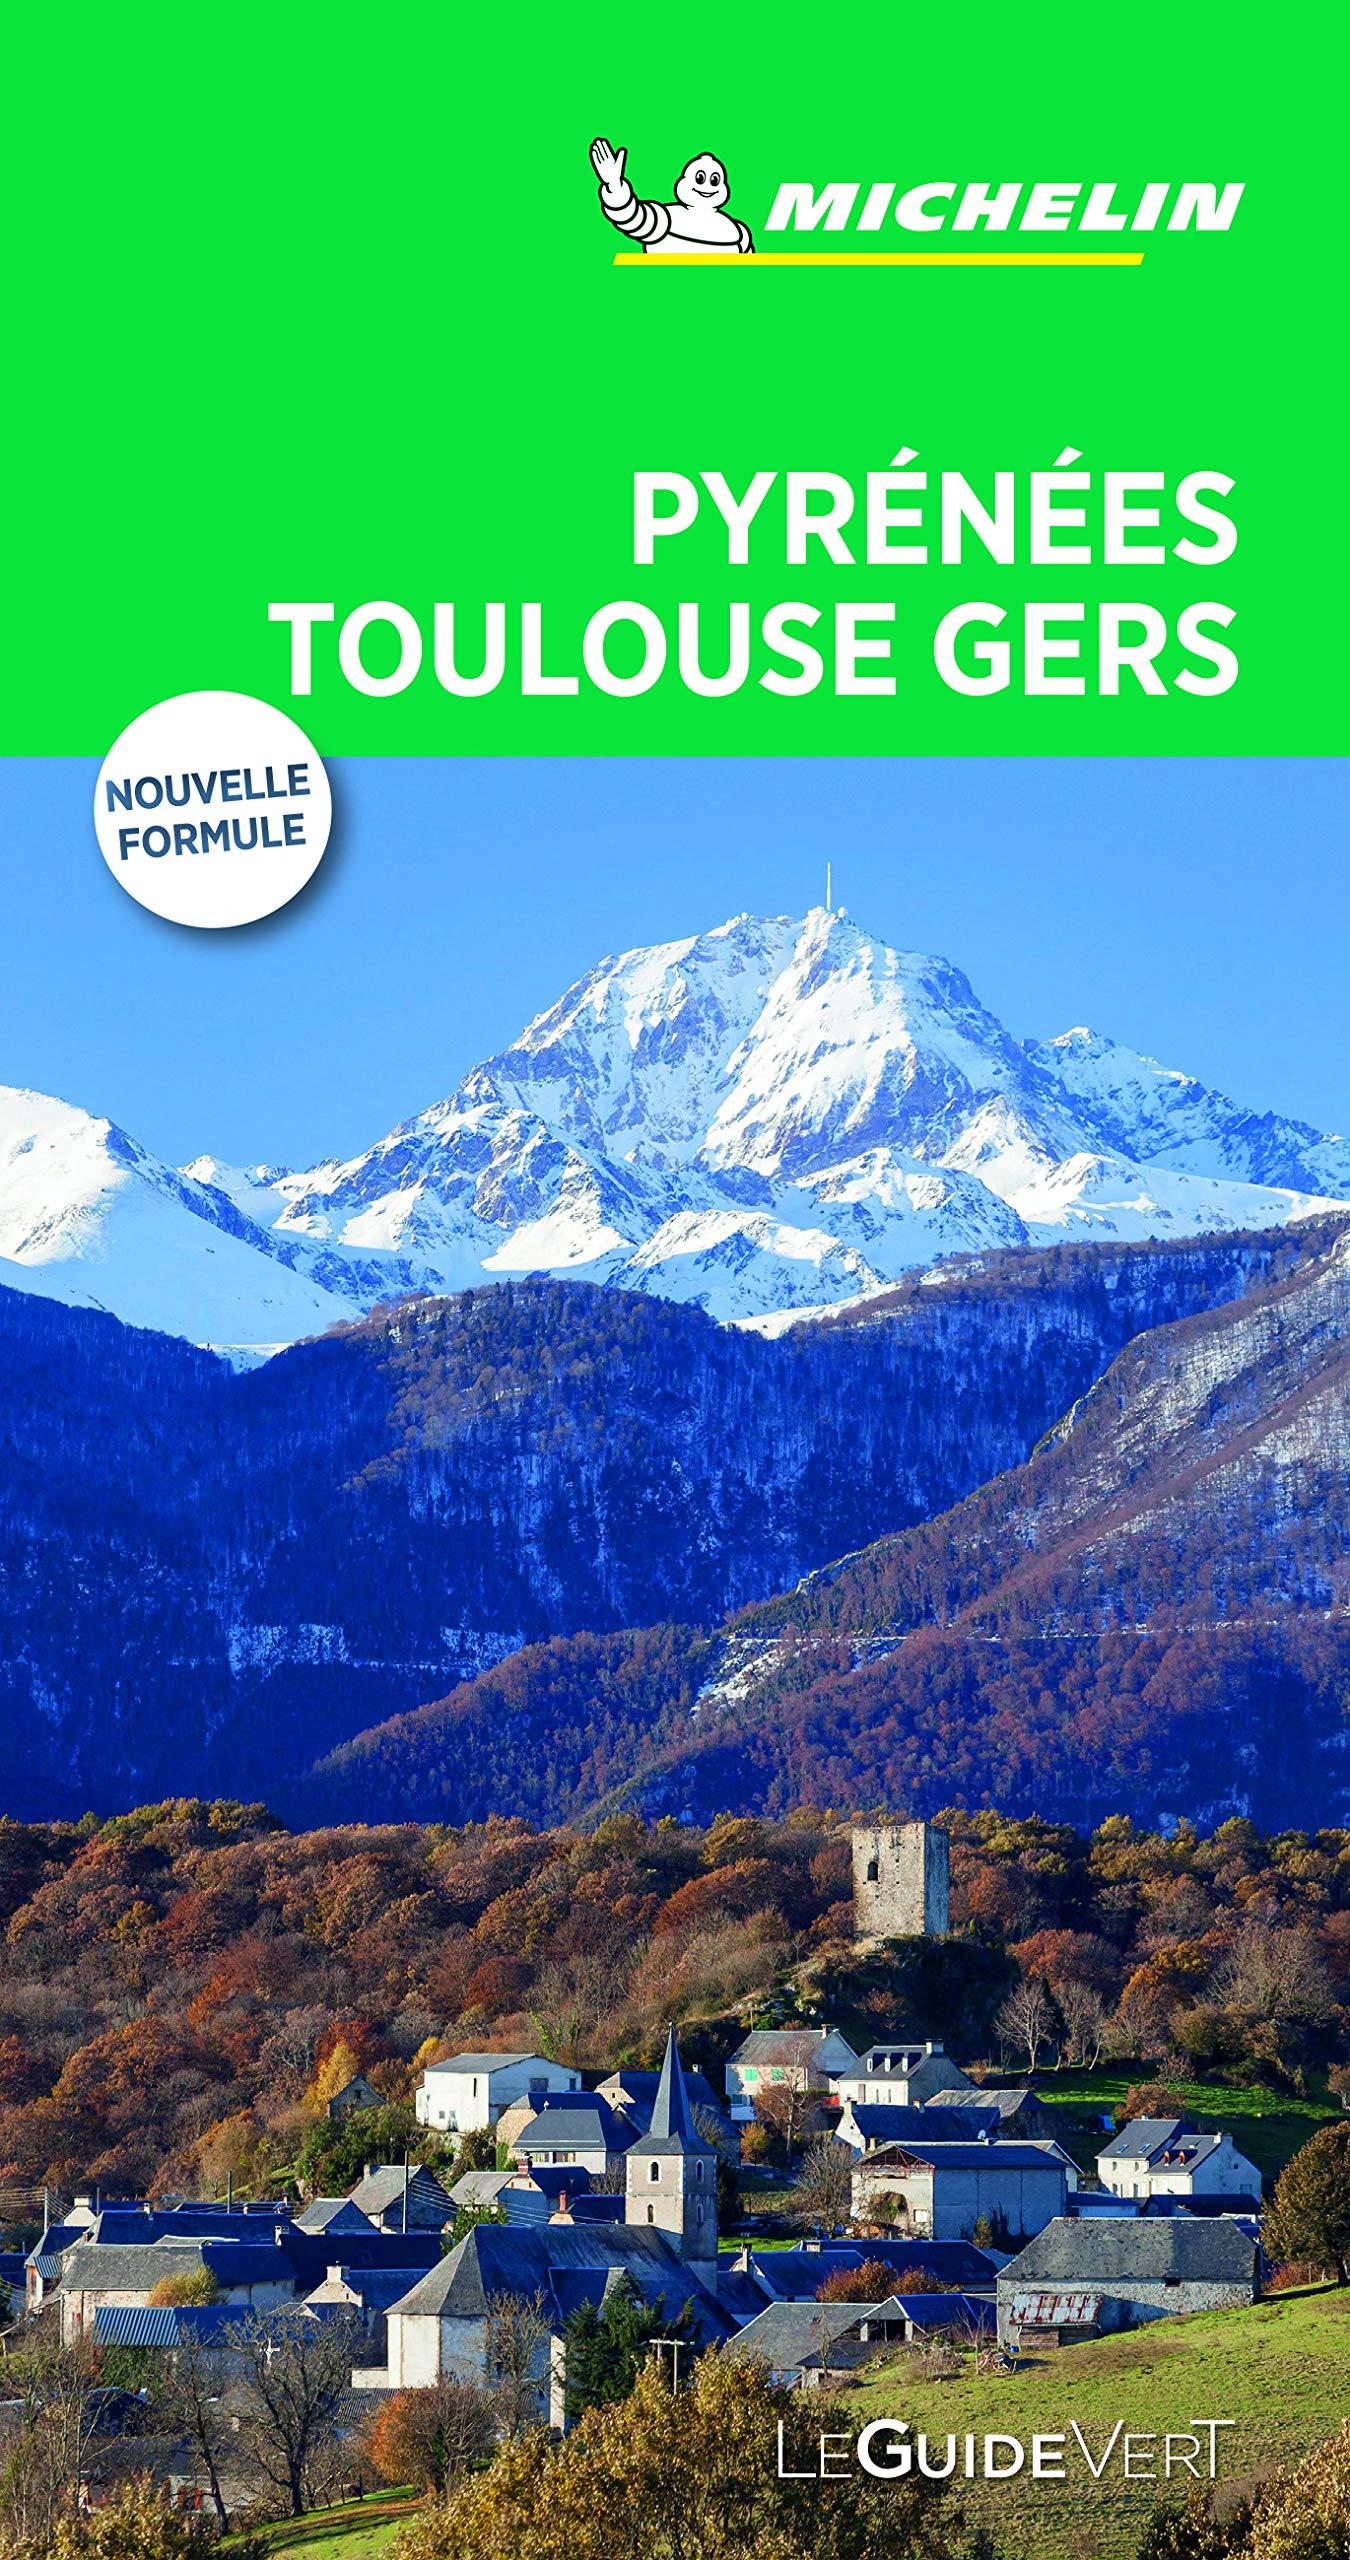 Pyrennées Toulouse Gers Le Guide Vert La Guía Verde Michelin: Amazon.es: MICHELIN: Libros en idiomas extranjeros